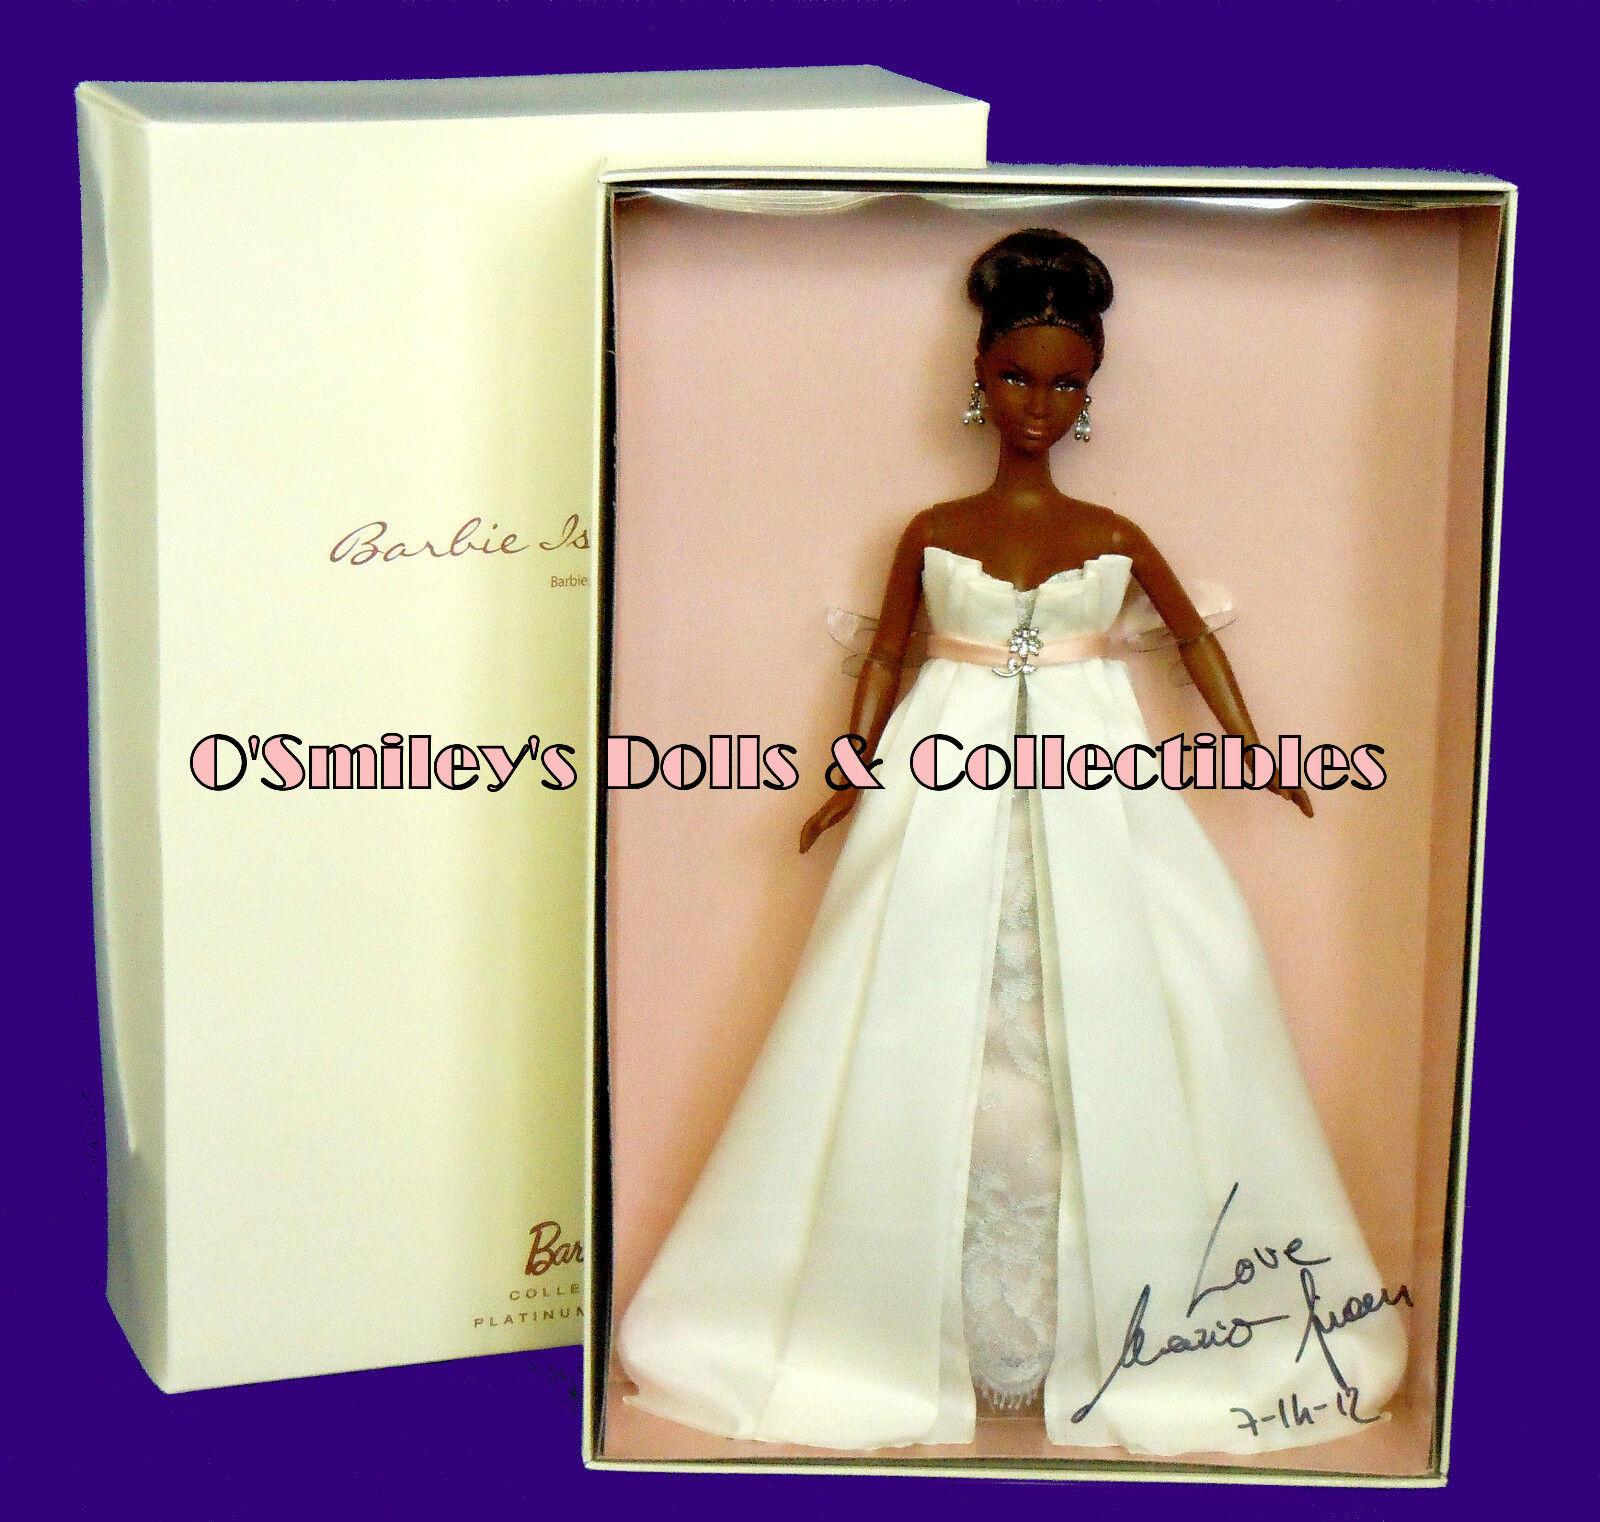 Barbie es eterna (AA) 2012 naranja County ndbc Convenio platinum_w3497_nrfb